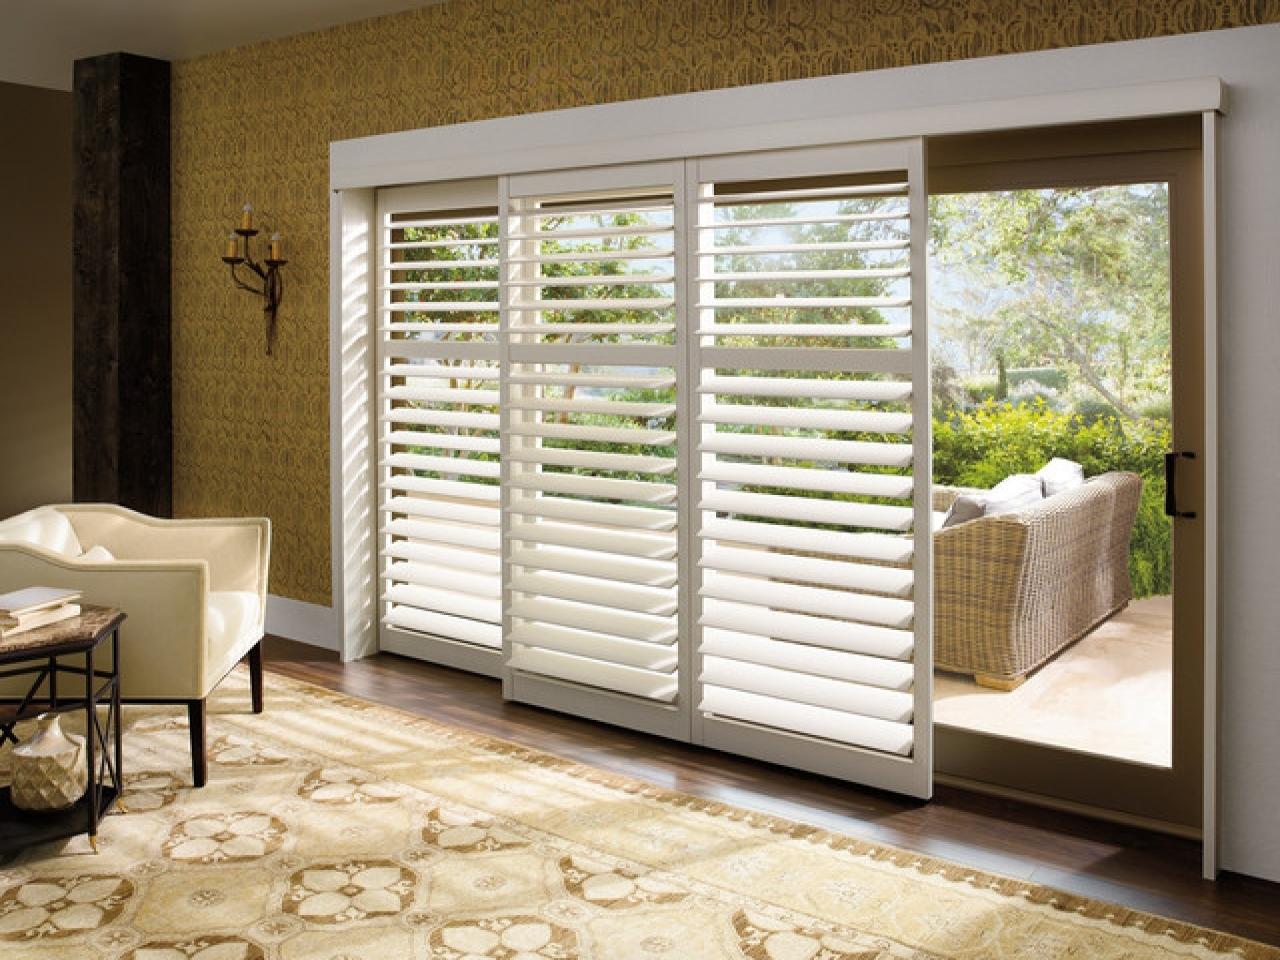 Window Blinds For Sliding Glass DoorsWindow Blinds For Sliding Glass Doors